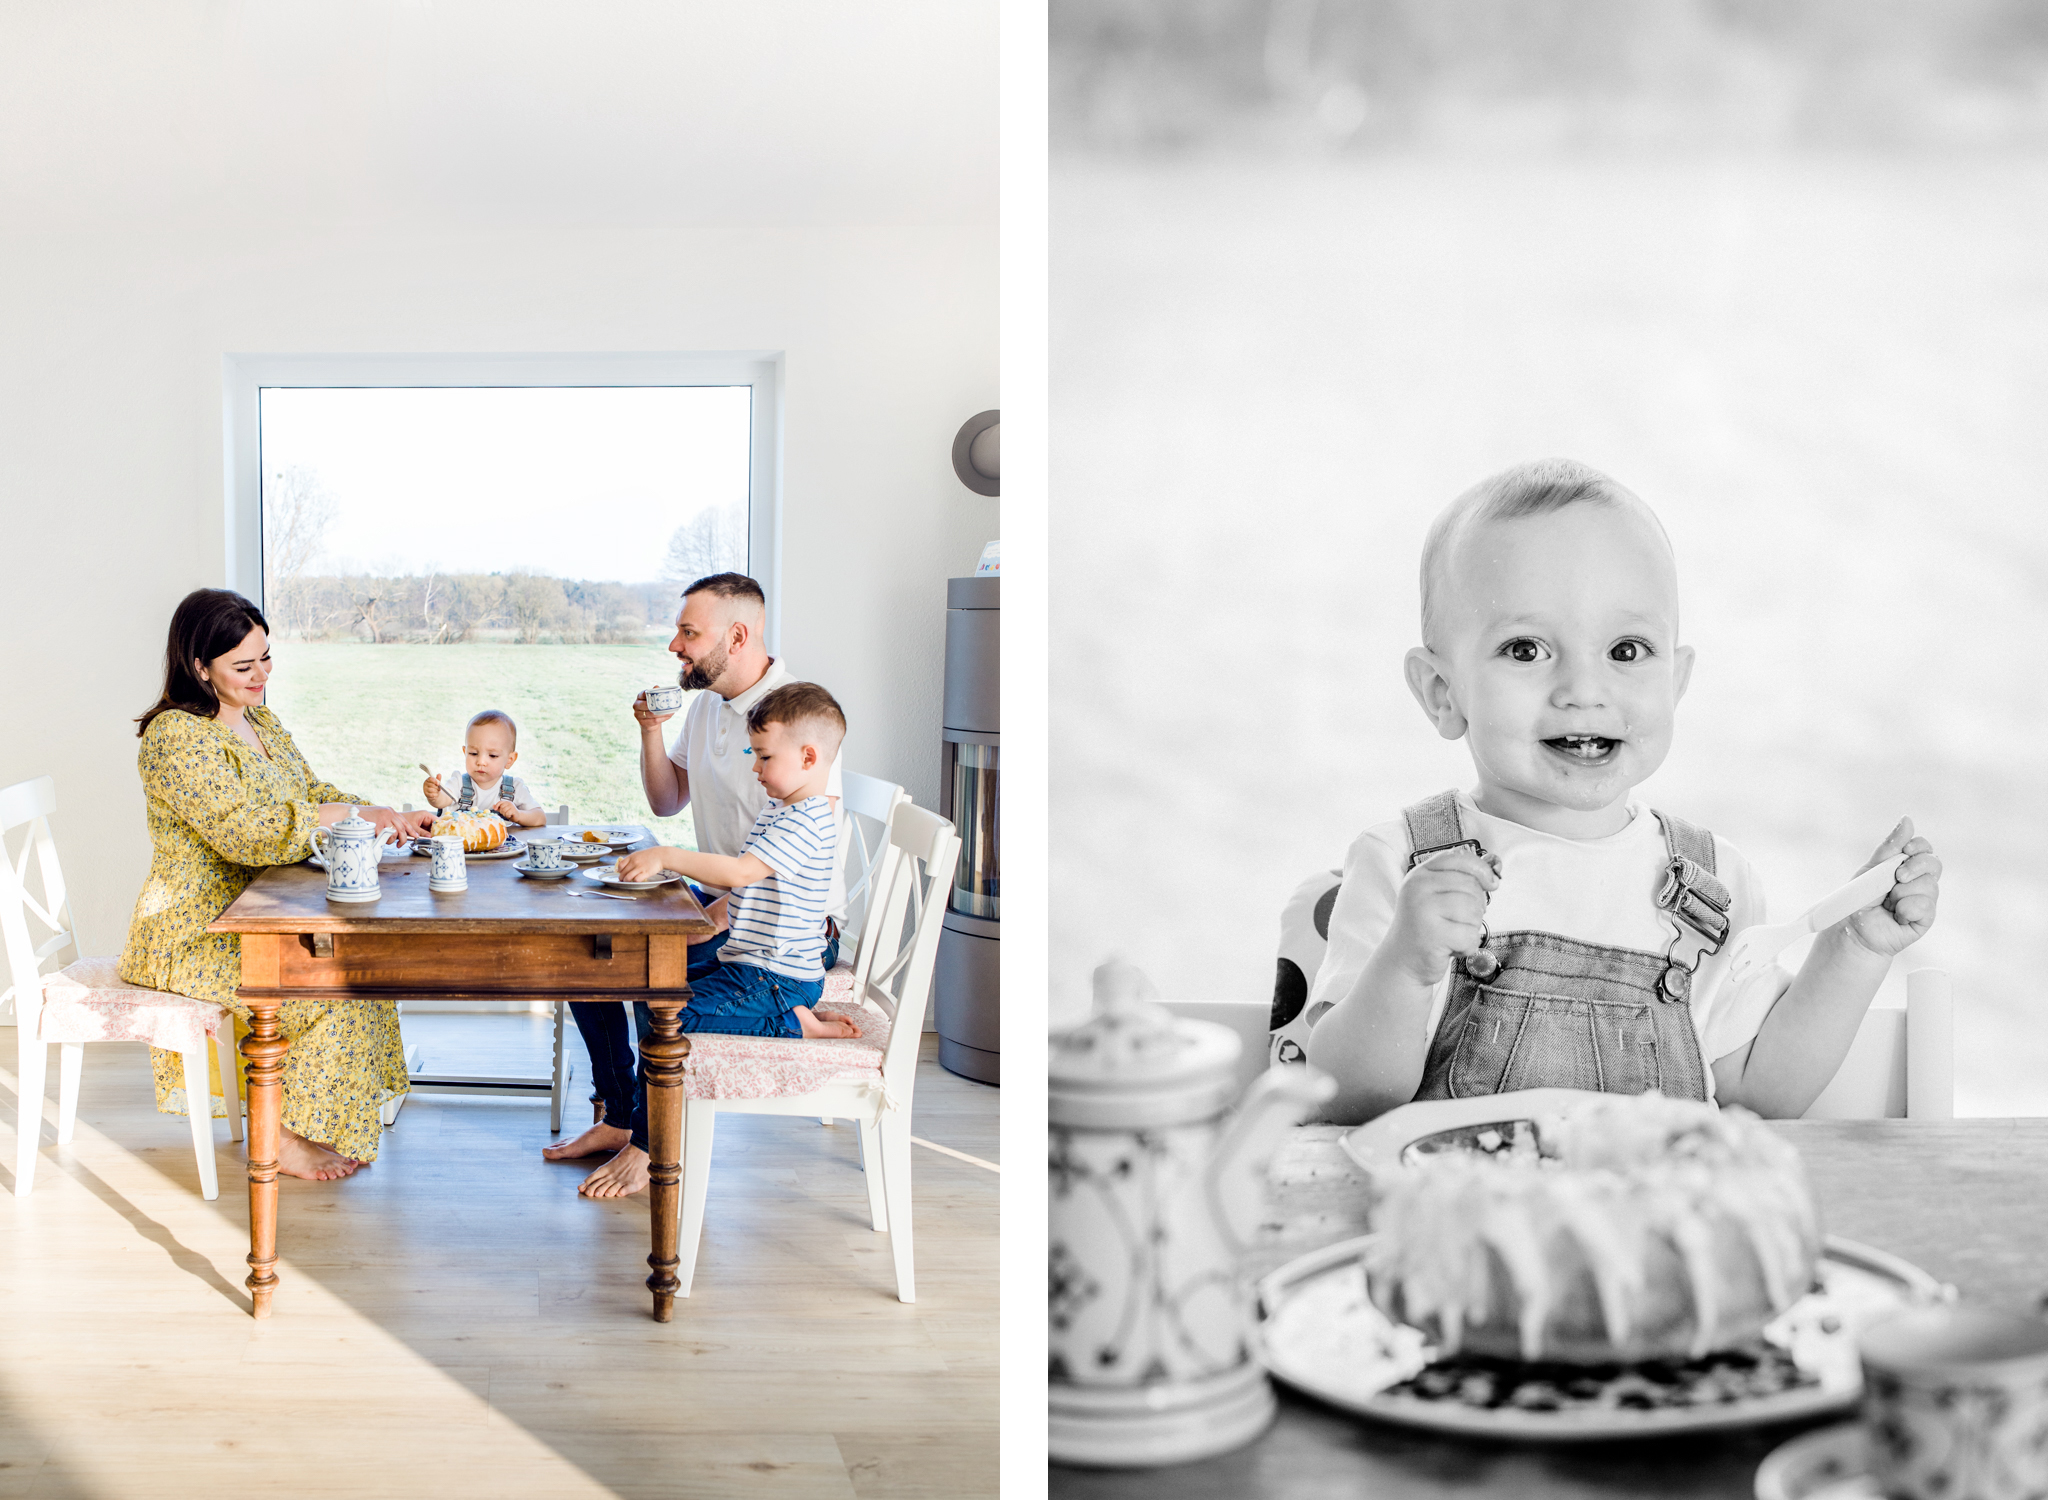 Fotoshooting zum 1. Geburtstag